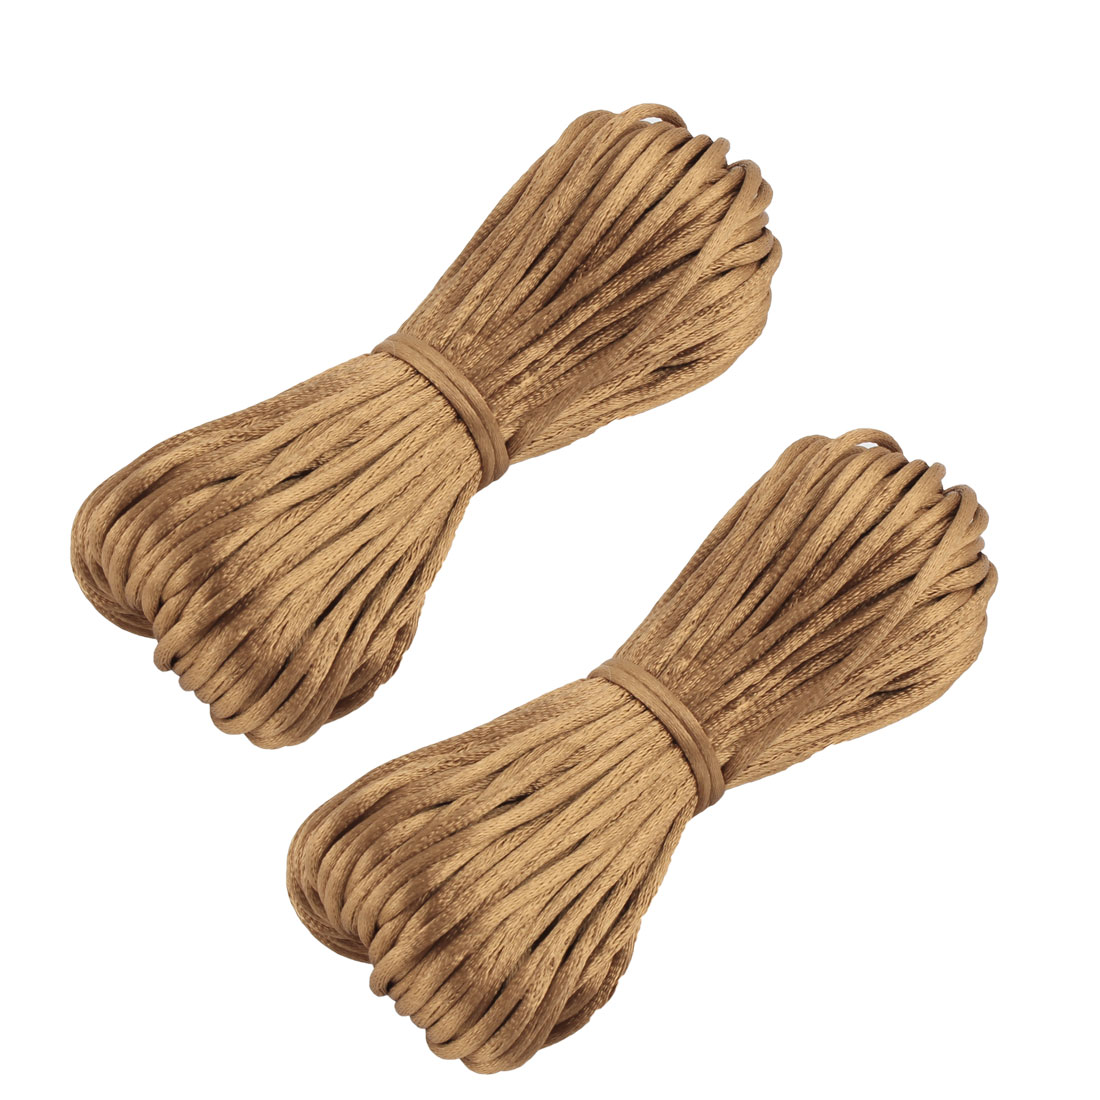 Festival Nylon Handmade DIY Chinese Knot Cord String Rope Brown 22 Yards 2pcs